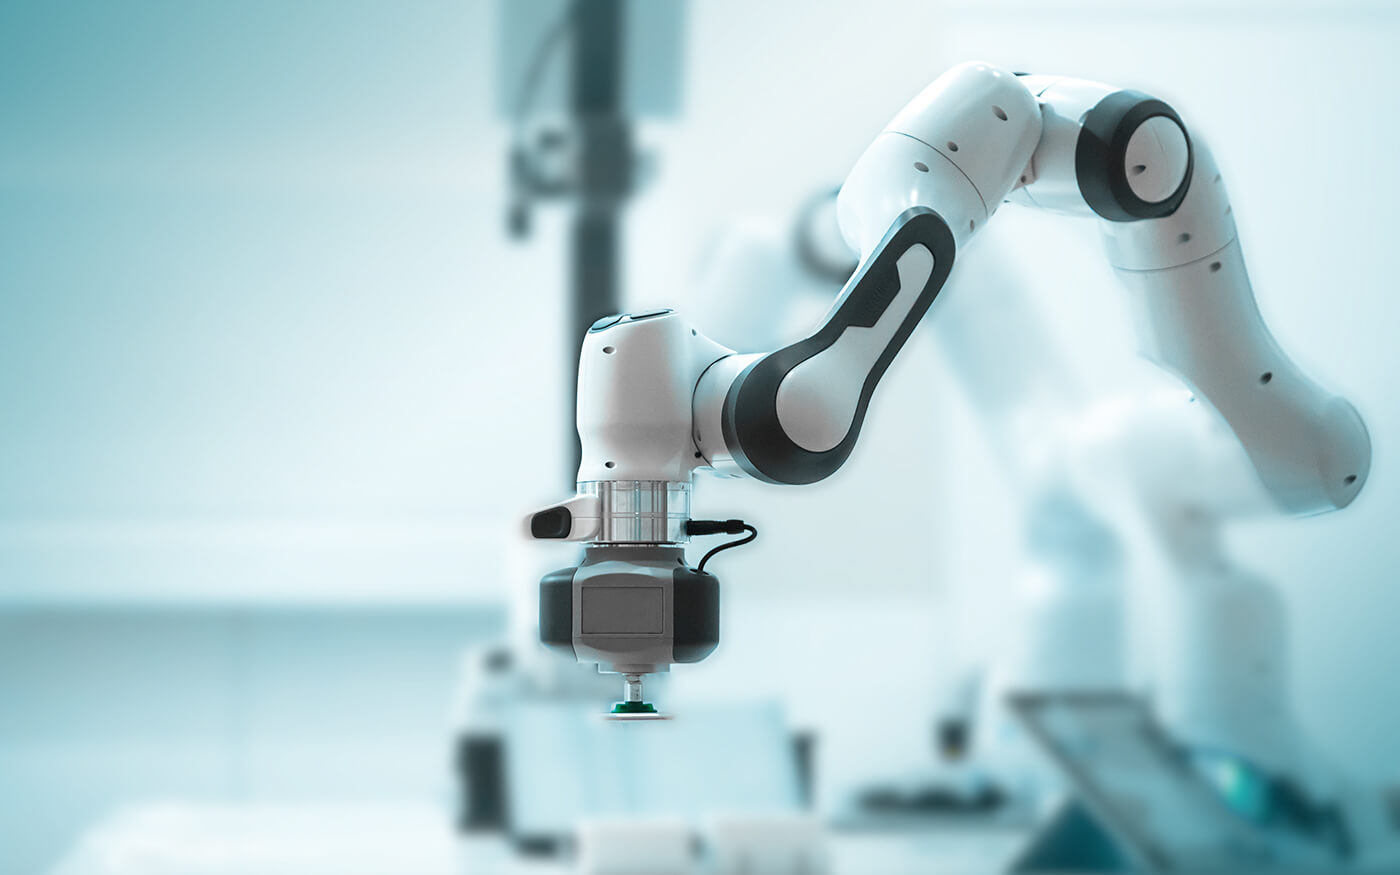 Prepreg Autoklav Industrie Robotik.jpg